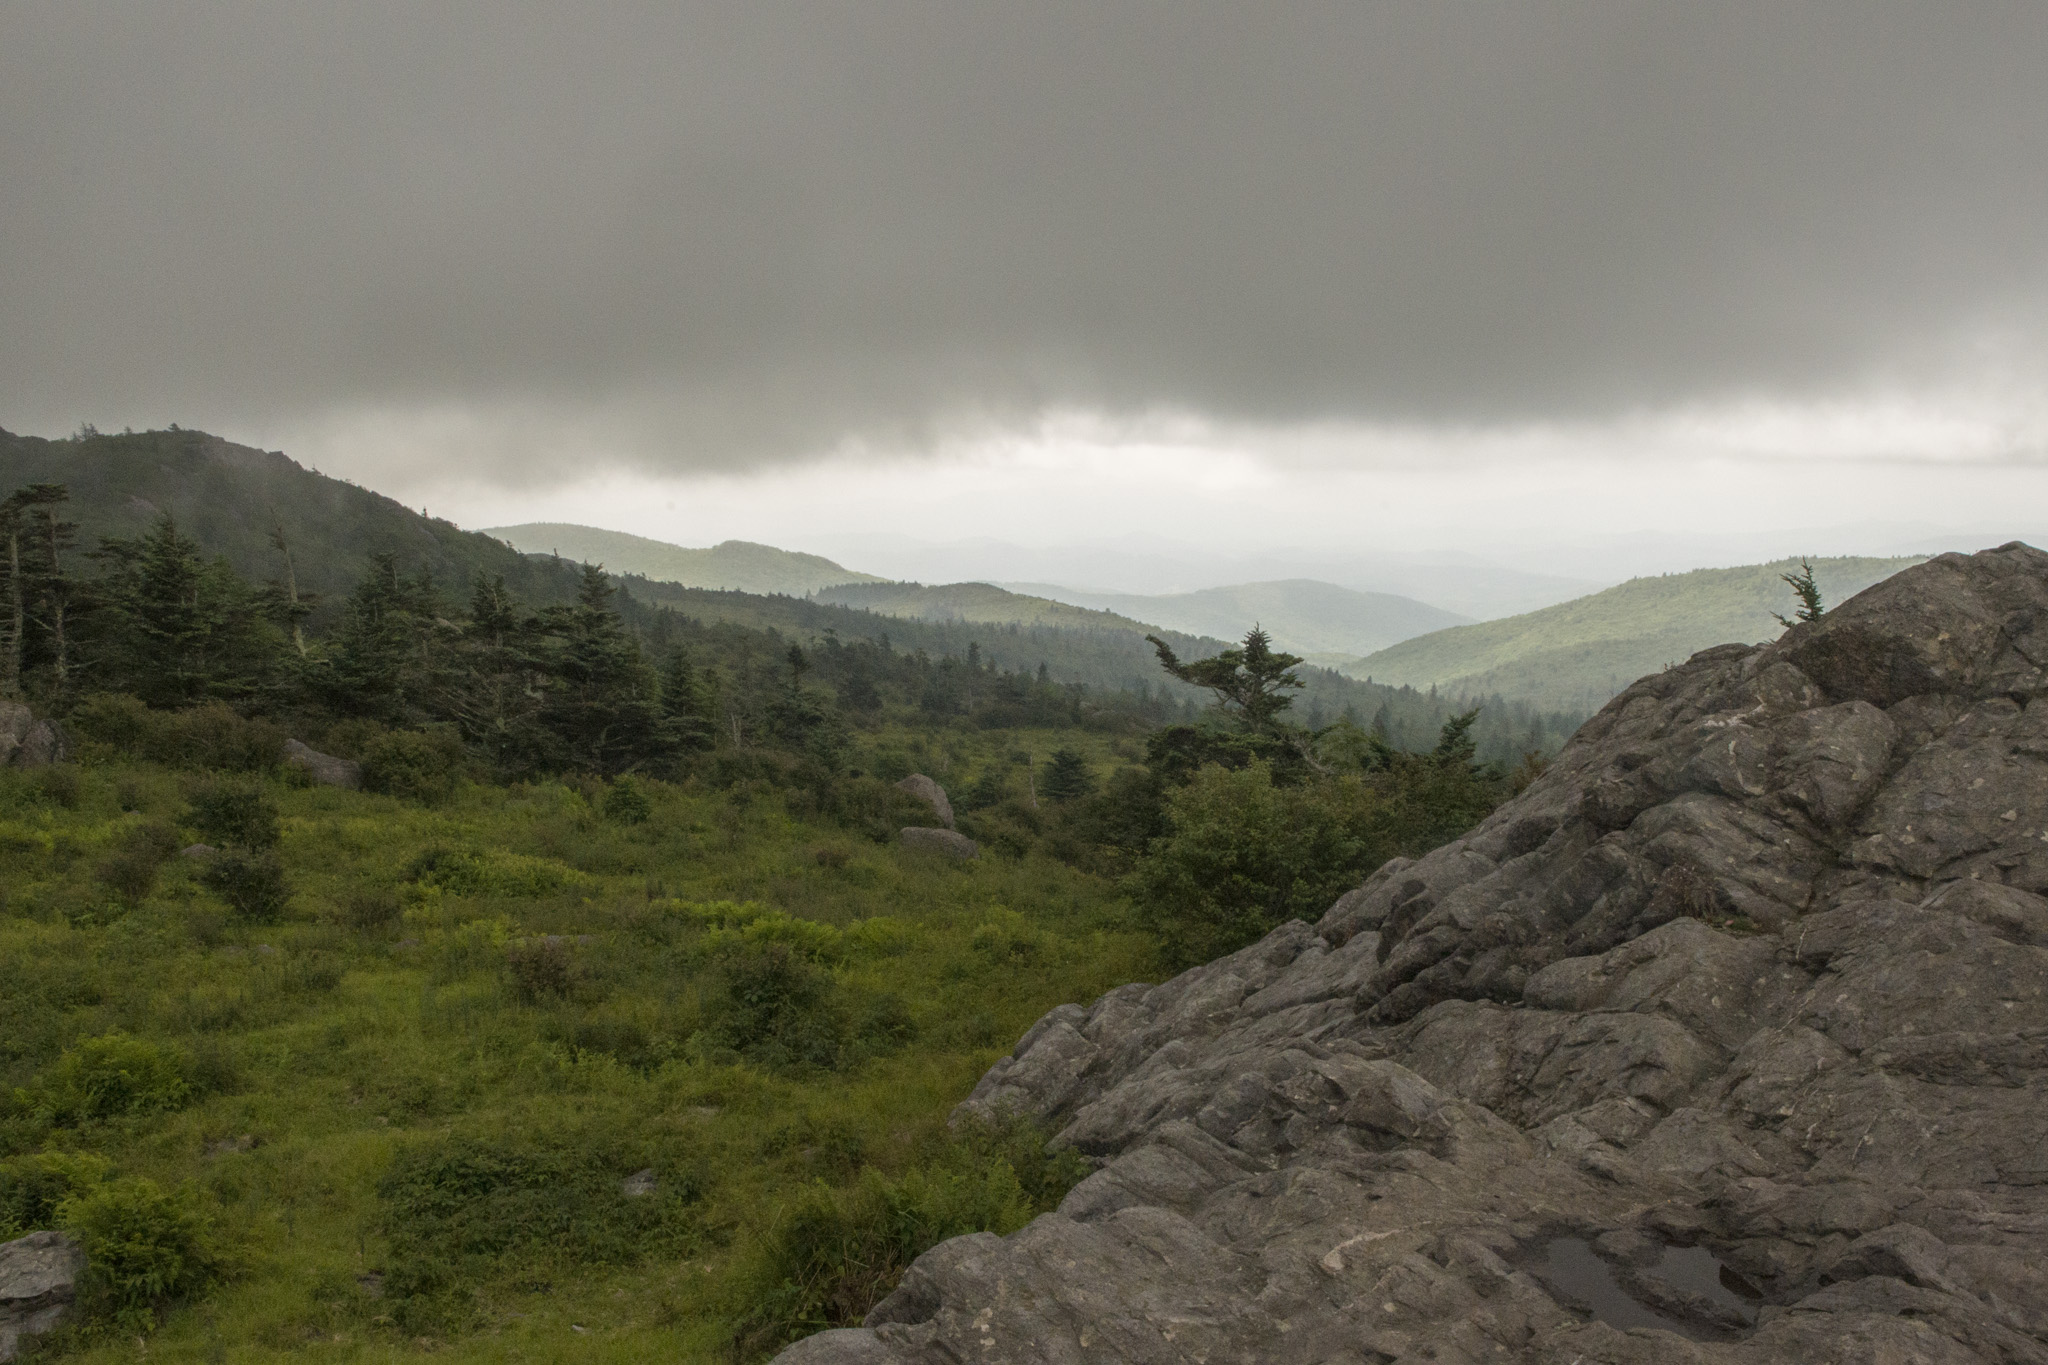 043_Mt_Rogers.jpg